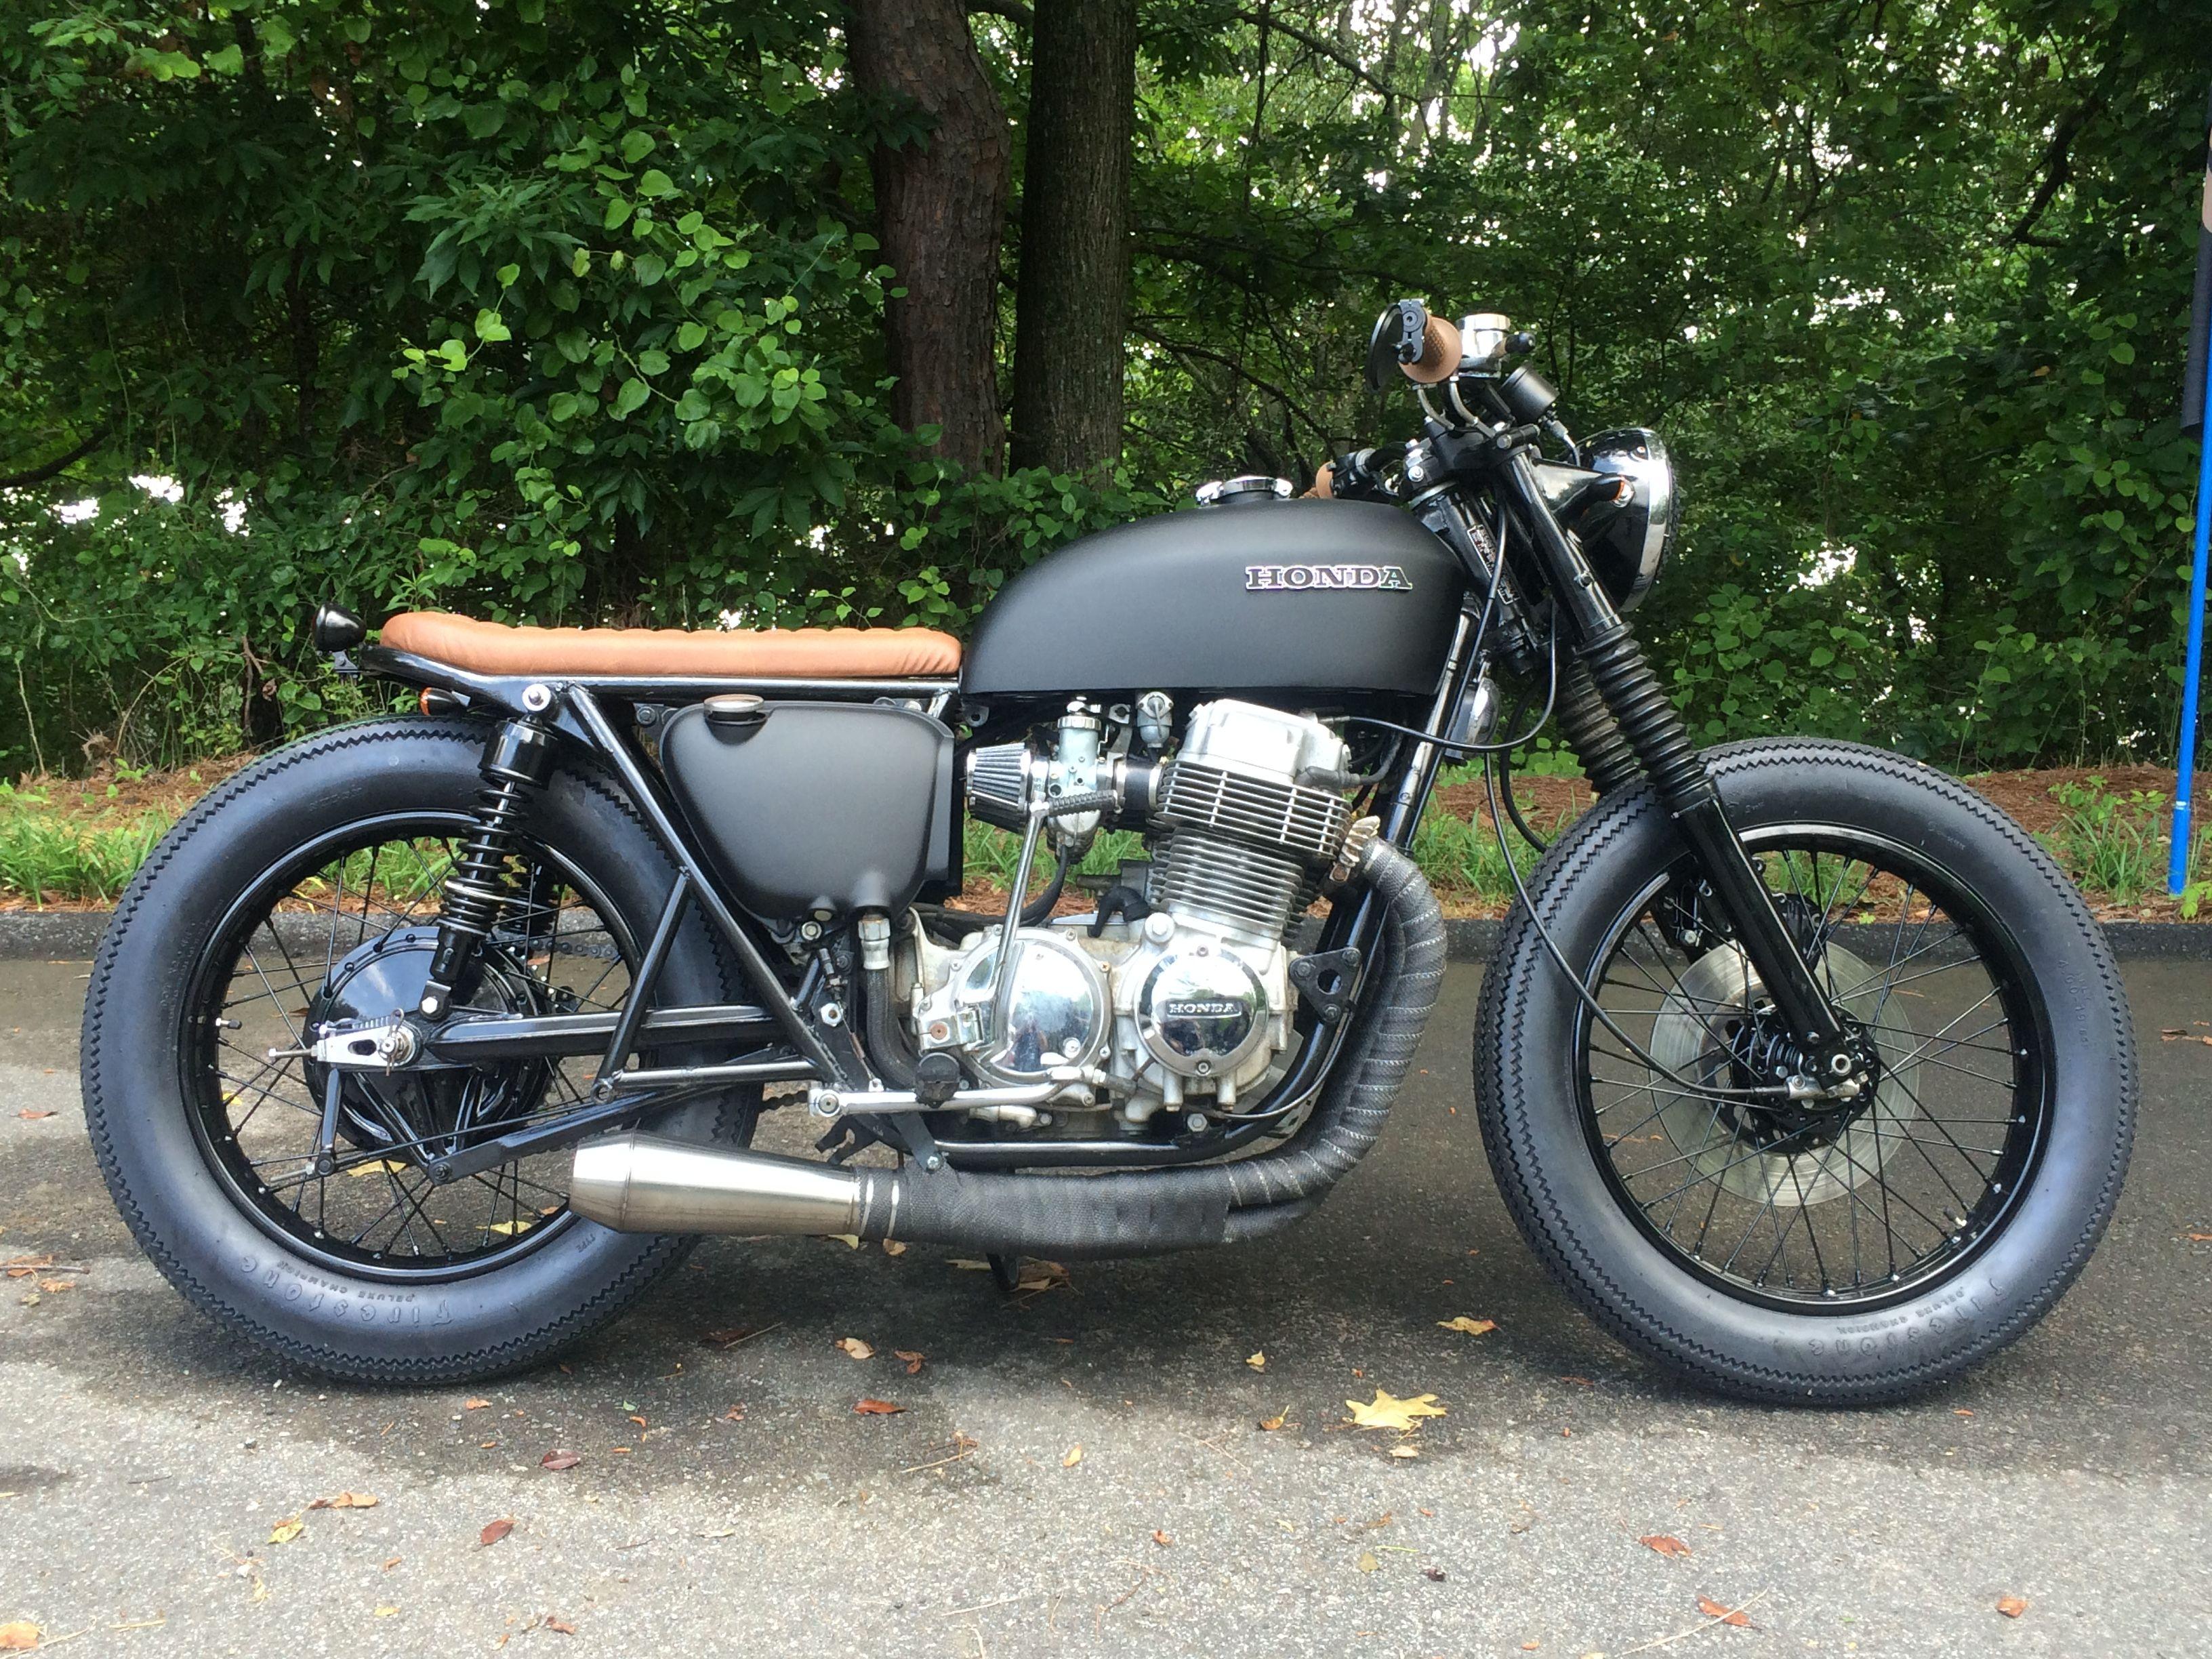 small resolution of custom honda cb750 brat by atlanta motorcycle works